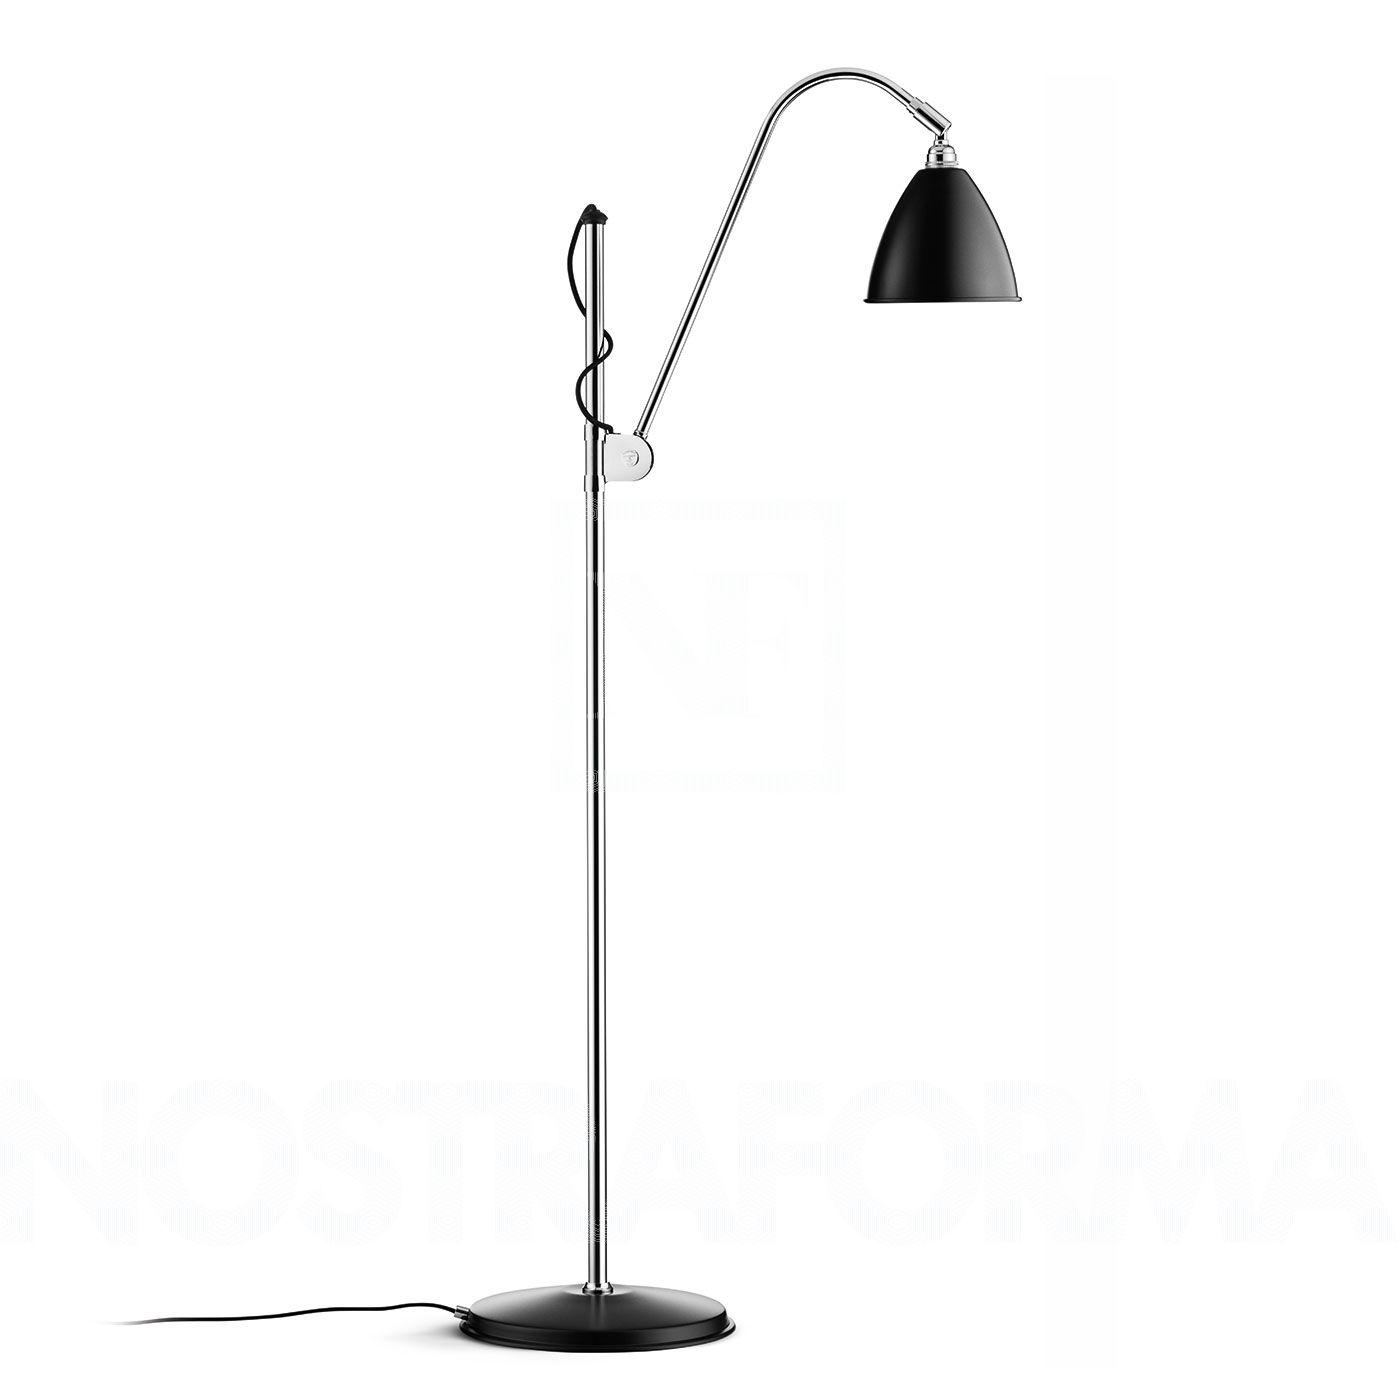 Gubi Bestlite Bl3 S Floor Lamp in size 1400 X 1400